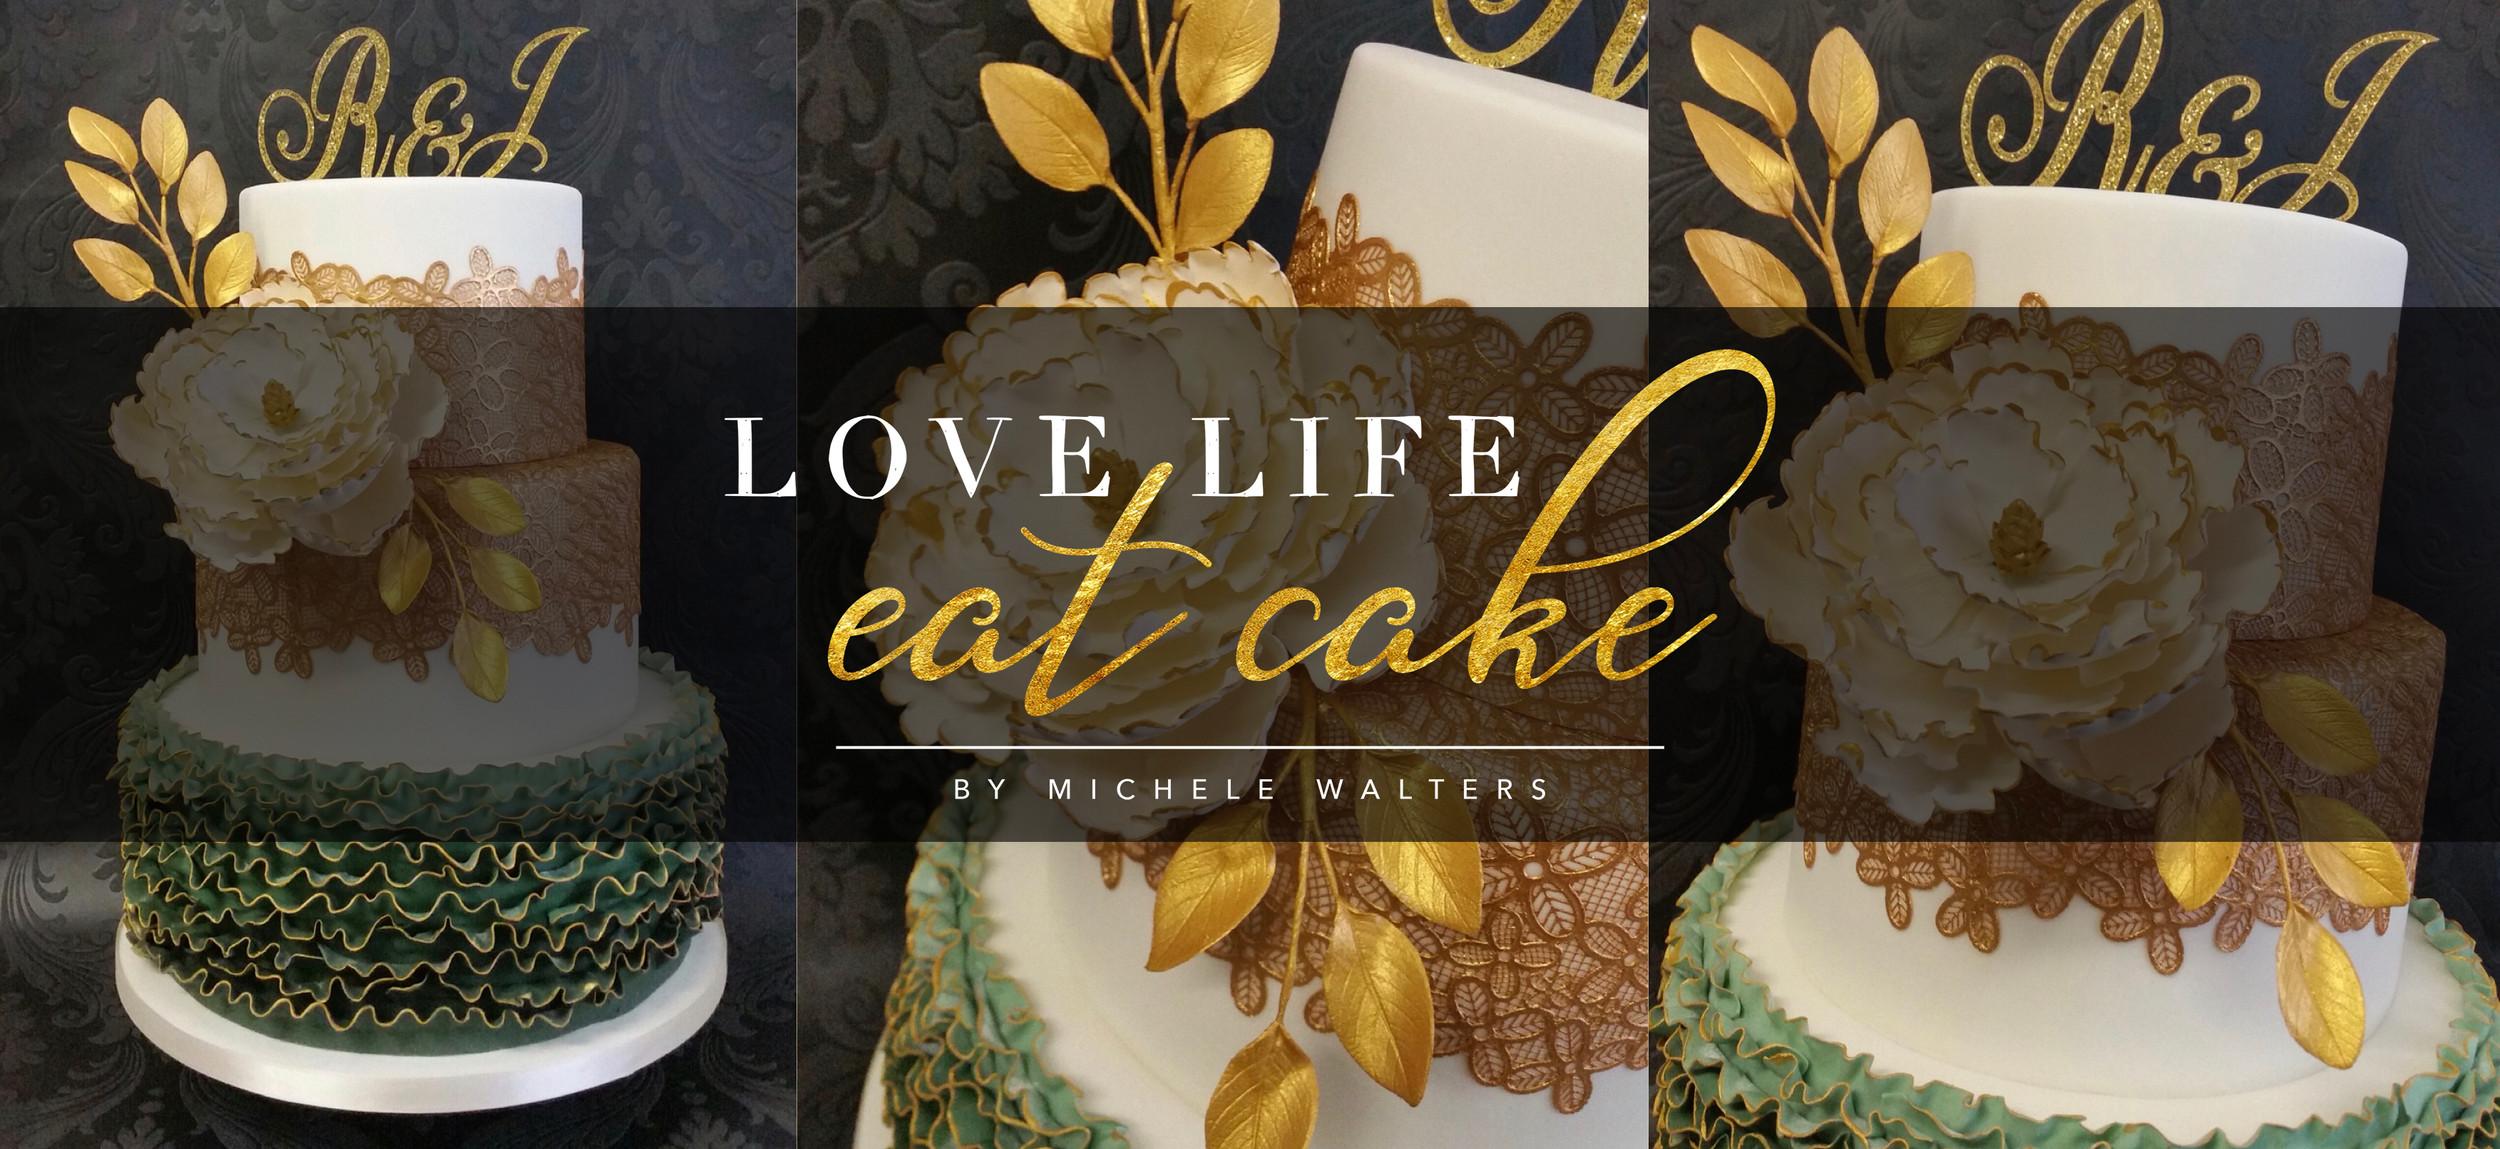 Cool Love Life Eat Cake By Michele Walters Cakes Oakham Rutlan Funny Birthday Cards Online Inifodamsfinfo